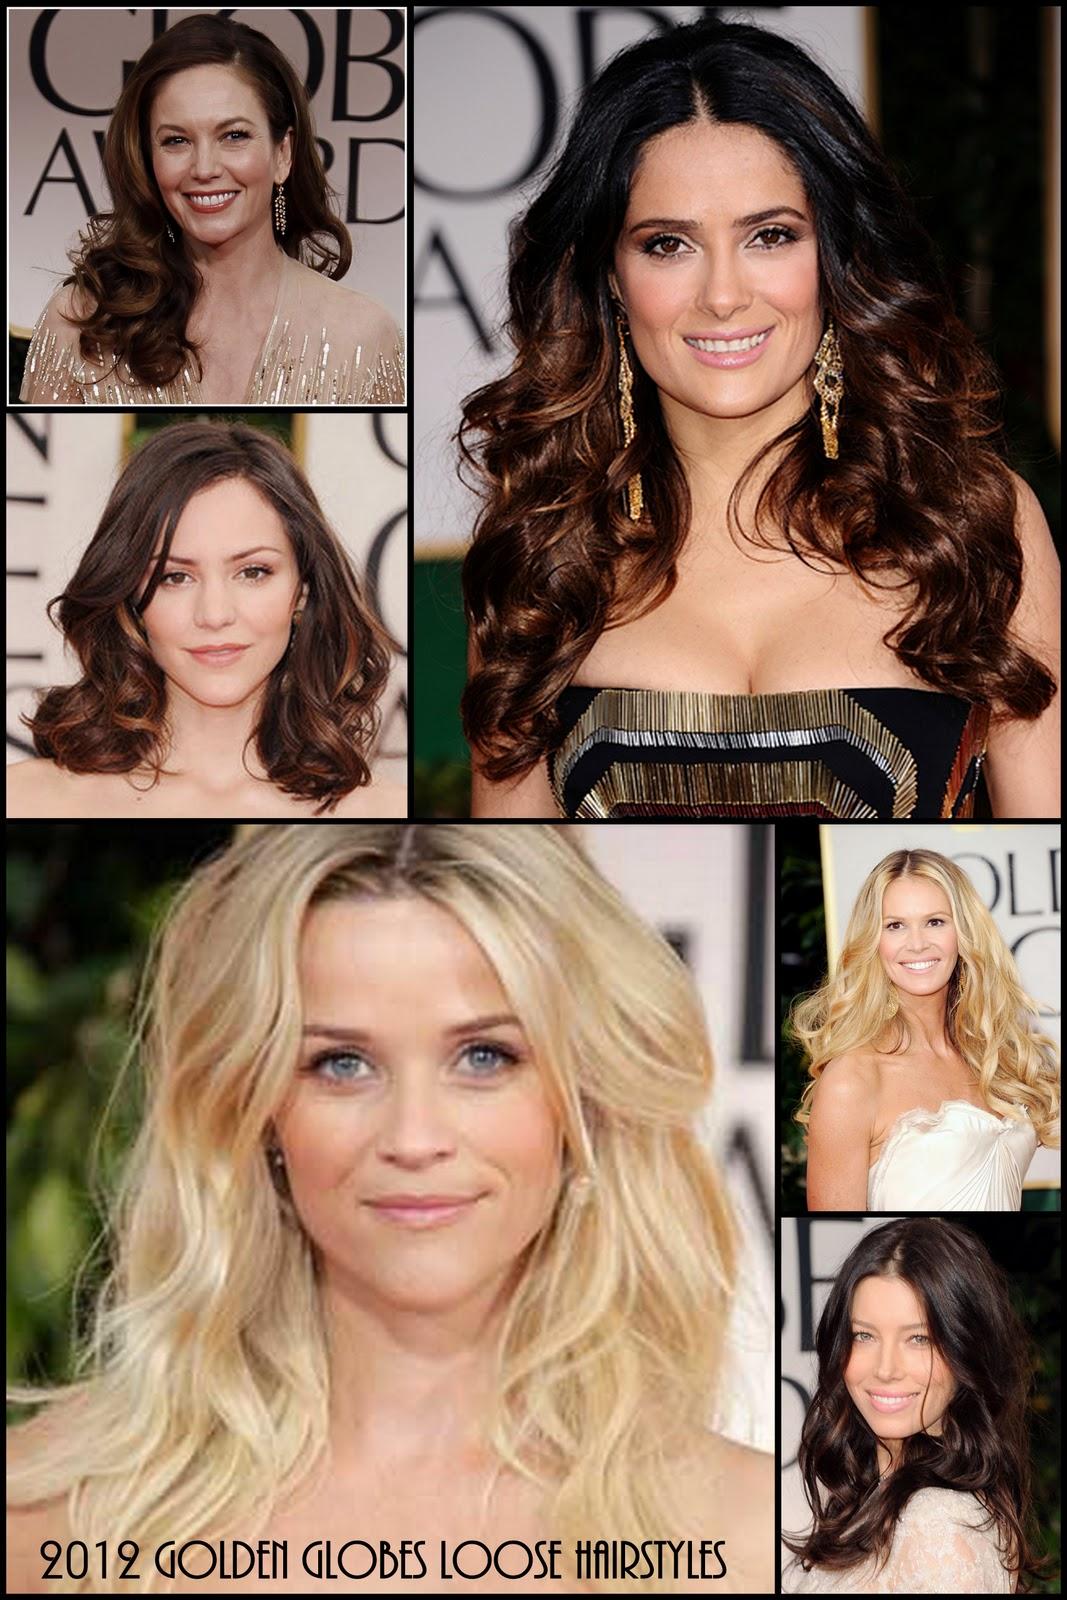 http://4.bp.blogspot.com/-3bqe4r9Wpz0/TxRPorPgG7I/AAAAAAAAEGU/xMYCtaYVNDA/s1600/loose+hairstyles+golden+globes.jpg